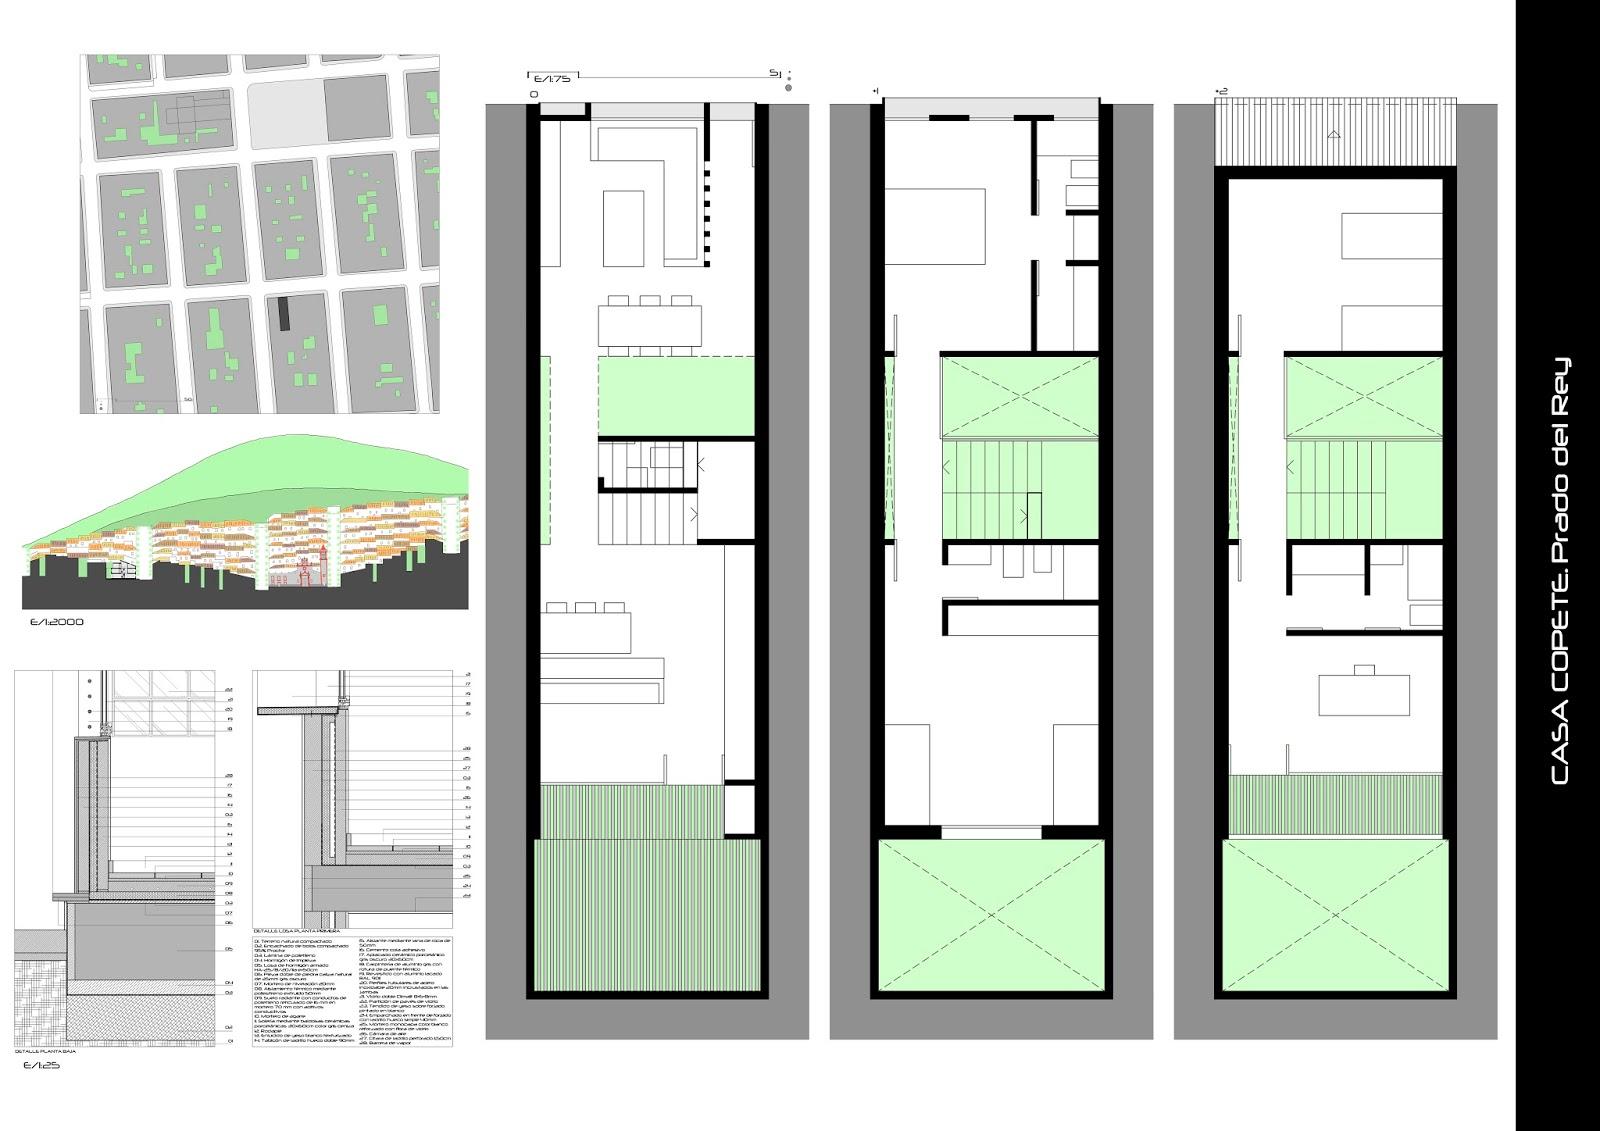 apuntes revista digital de arquitectura tres casas